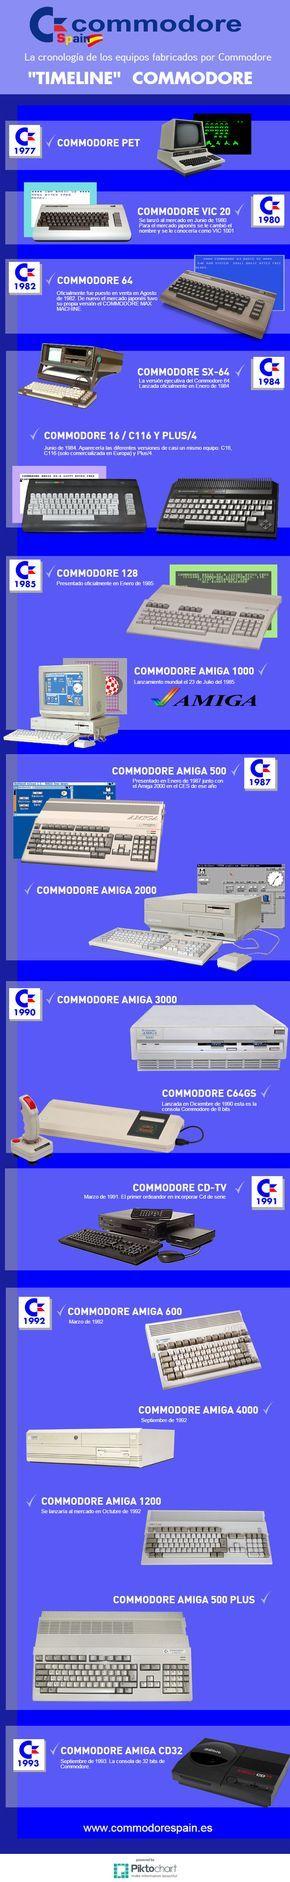 Timeline Commodore